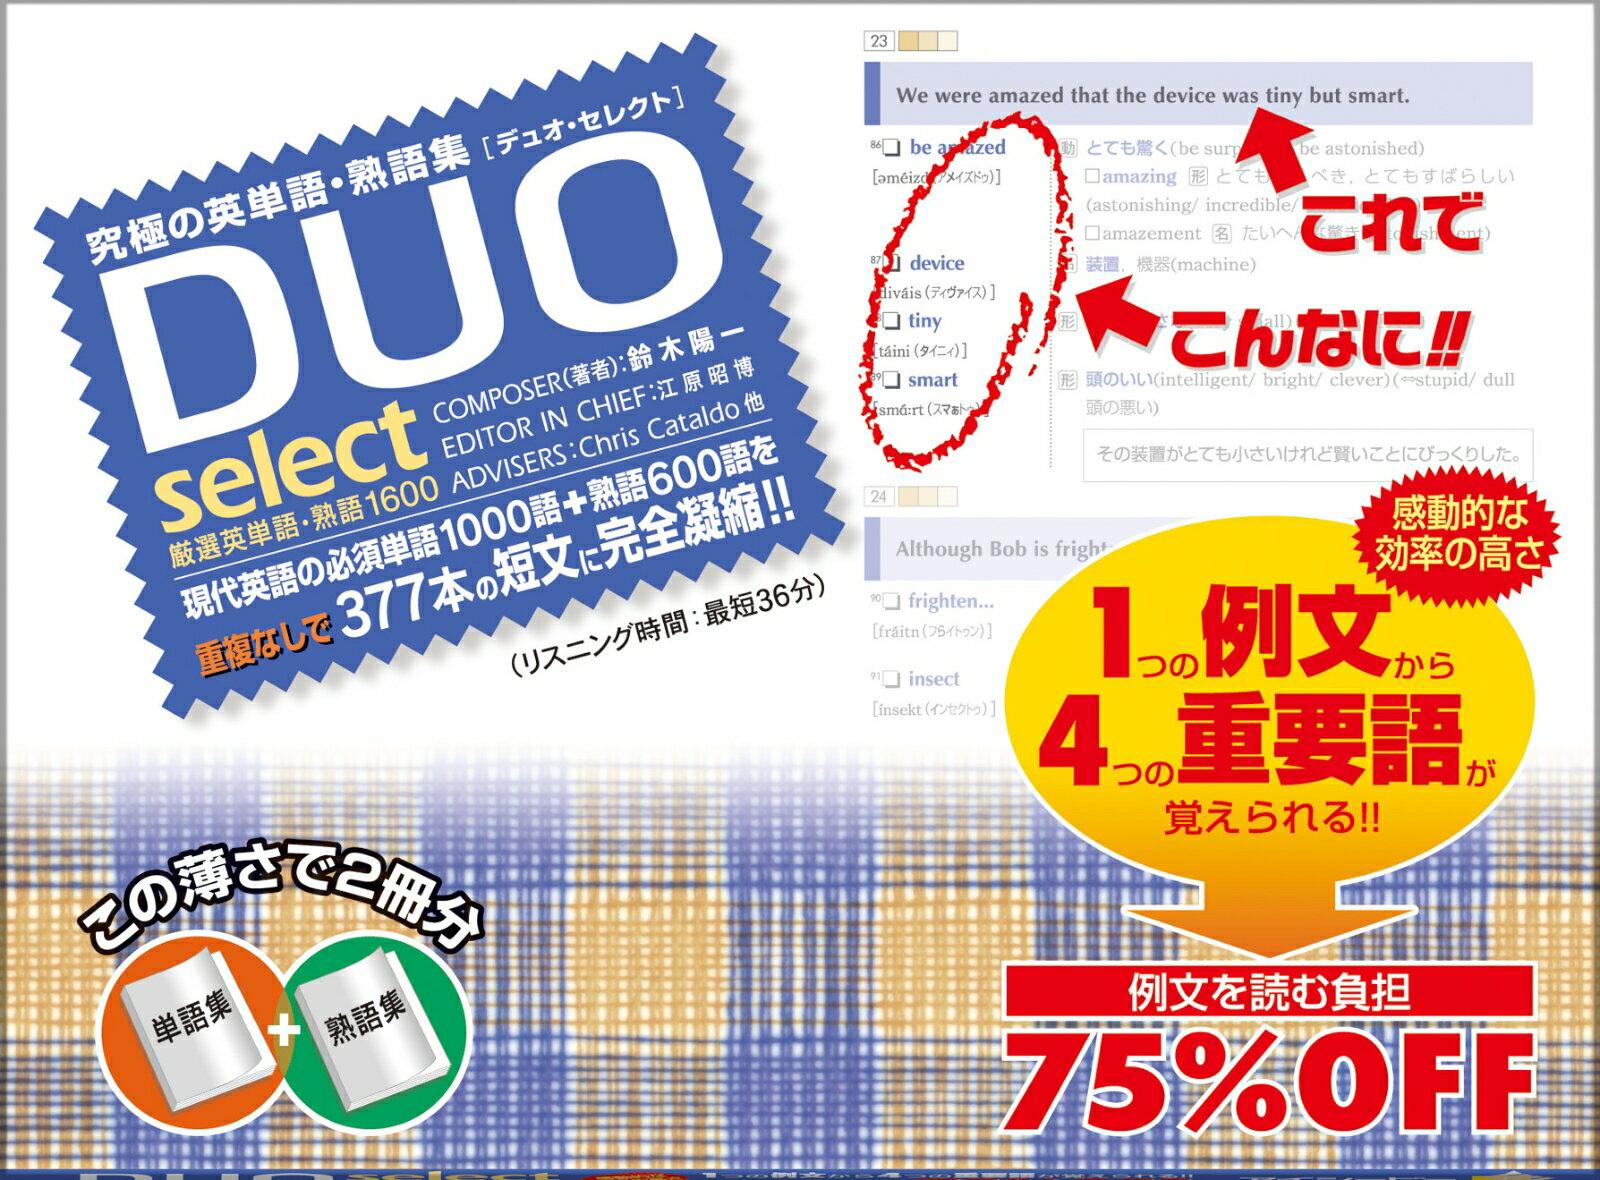 DUO(デュオ)セレクト 厳選英単語・熟語1600